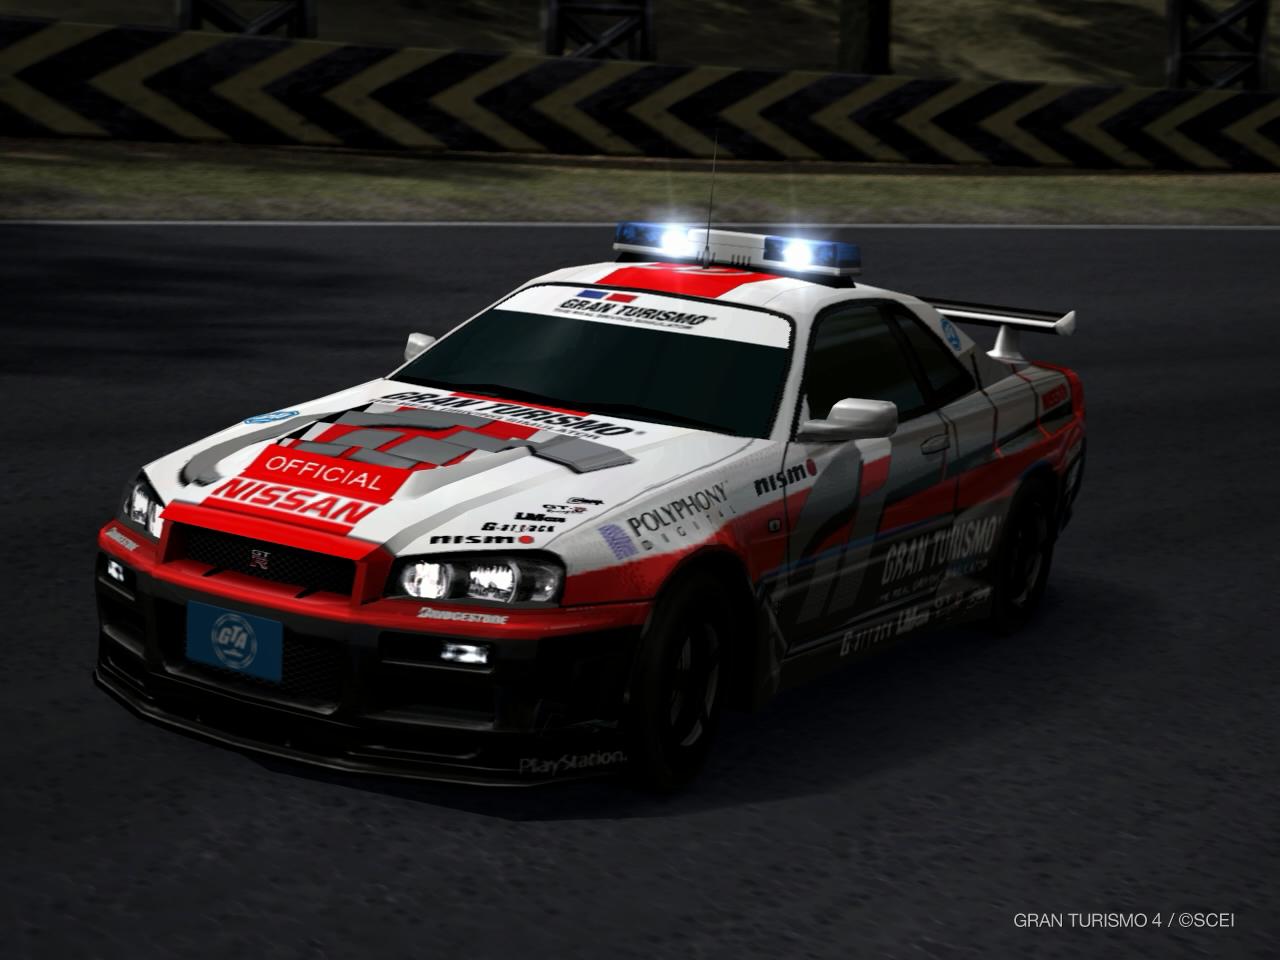 Turismo Car: Nissan GRAN TURISMO SKYLINE GT-R (PaceCar) '01